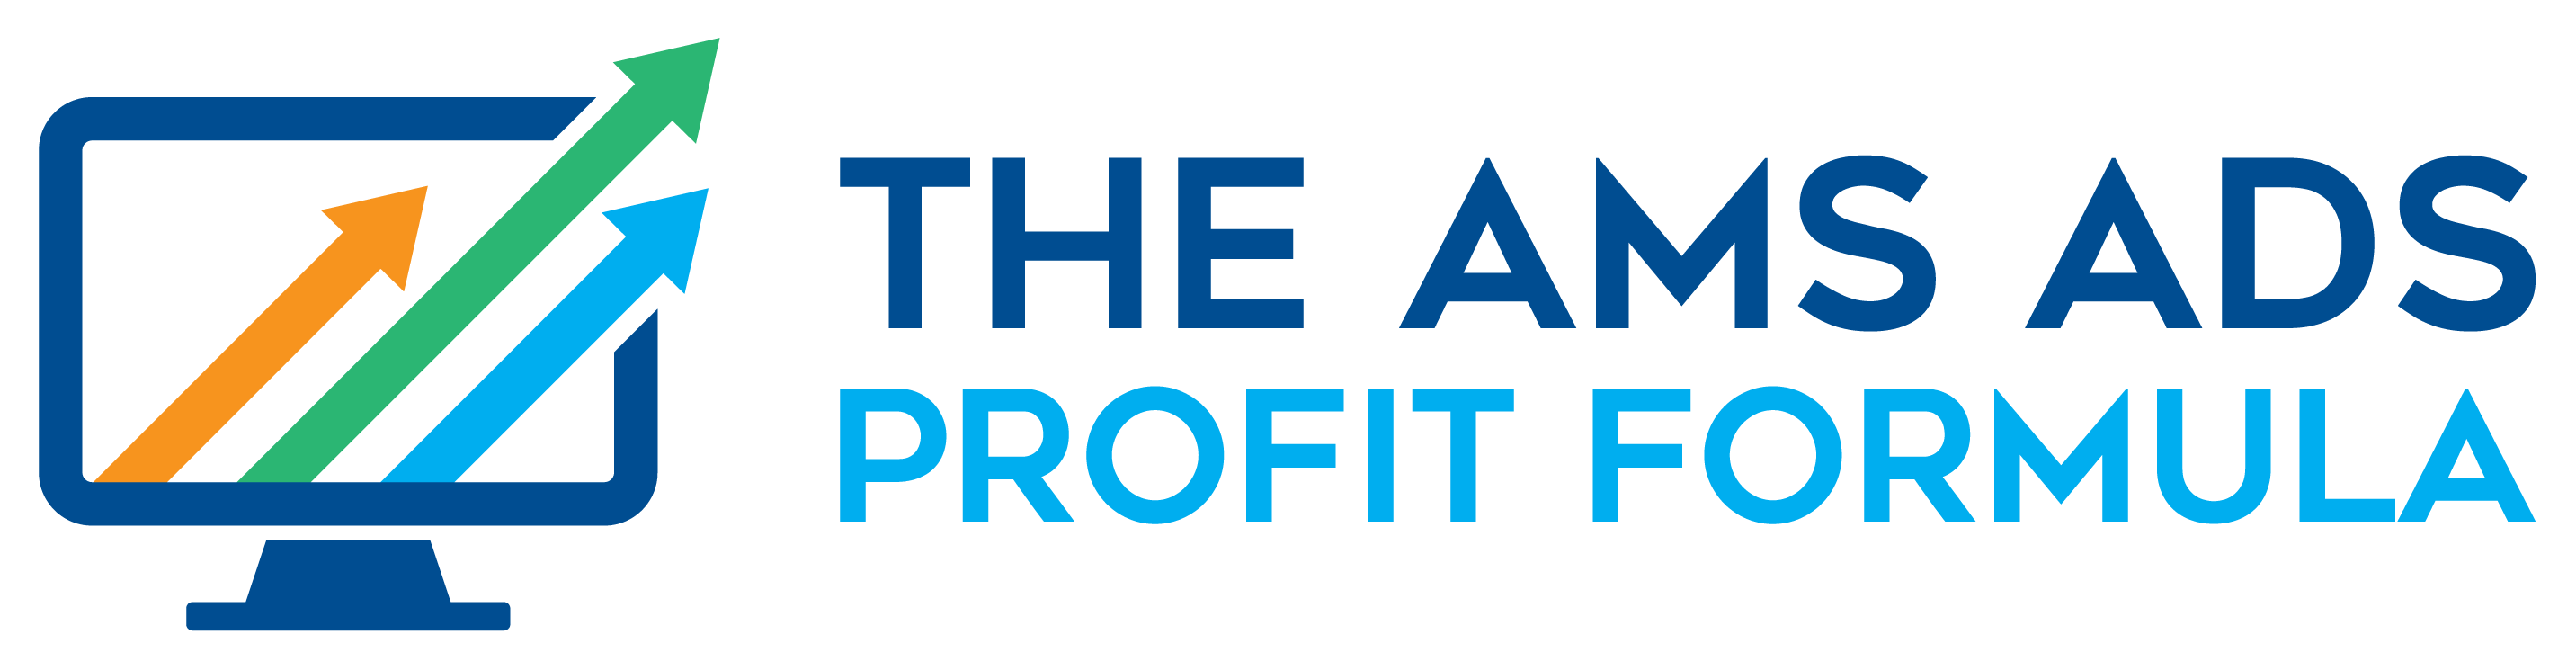 The AMS Ads Profit Formula